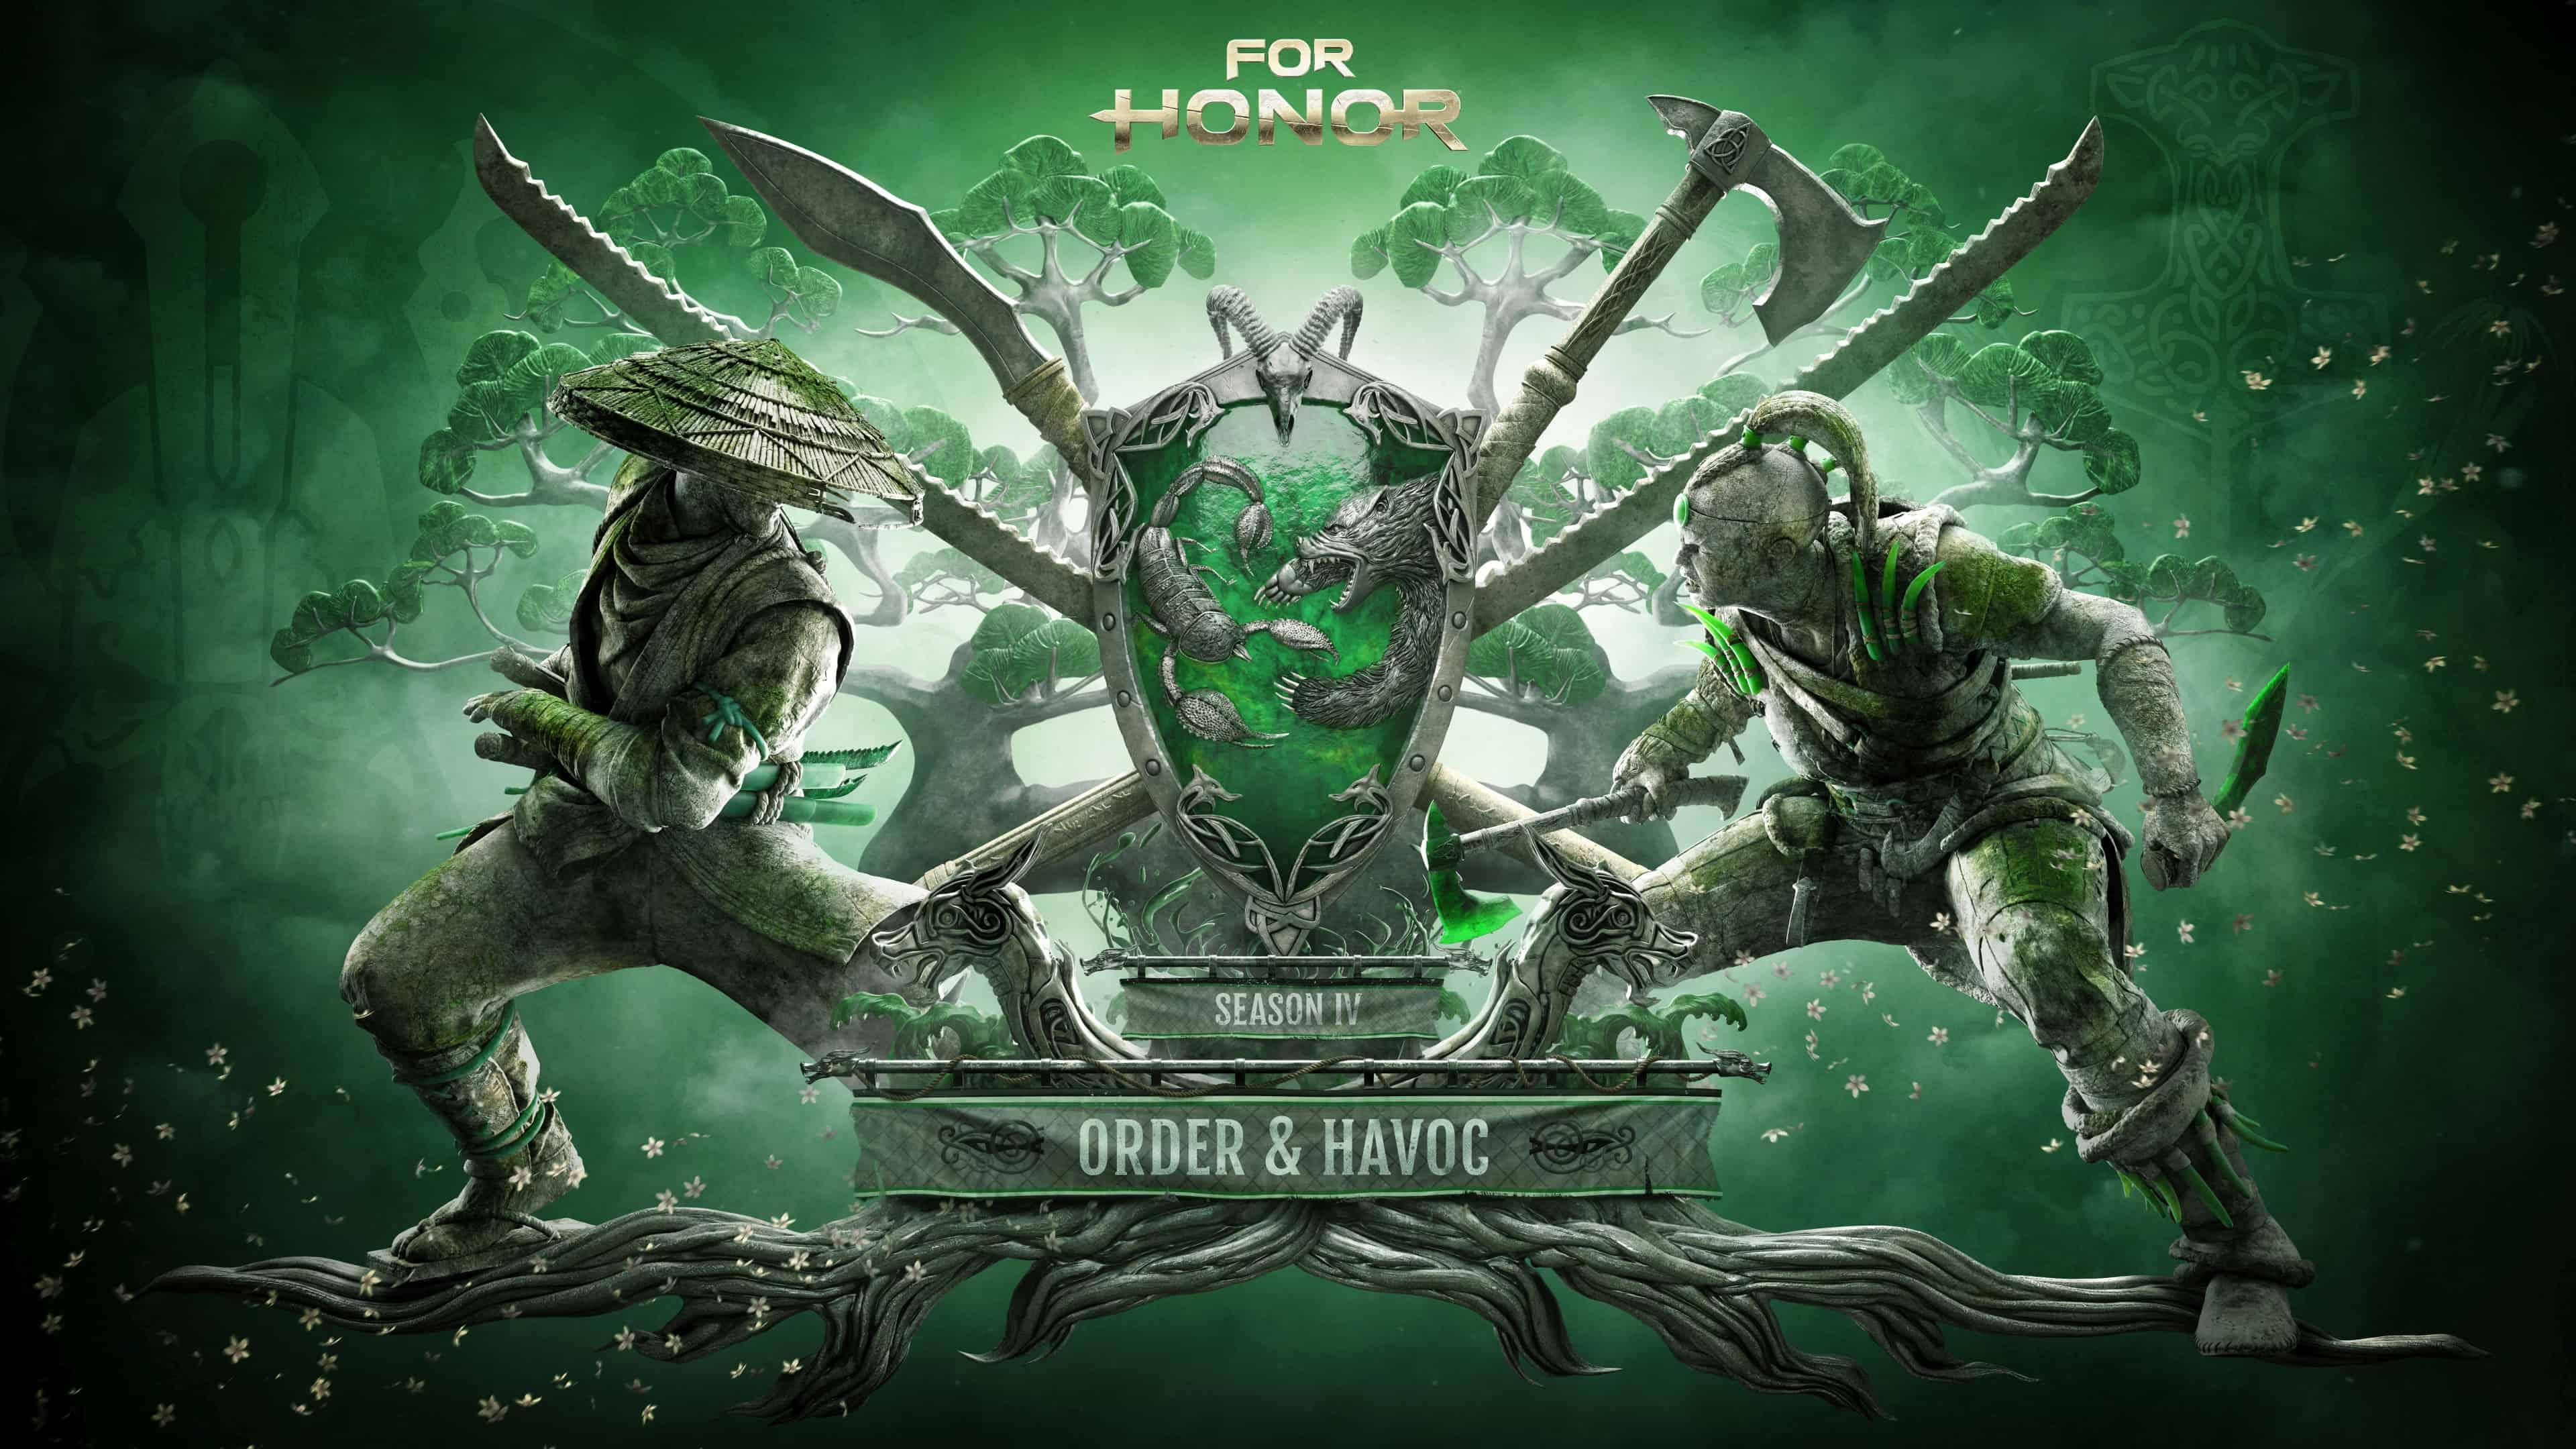 for honor season 4 order and havoc uhd 4k wallpaper